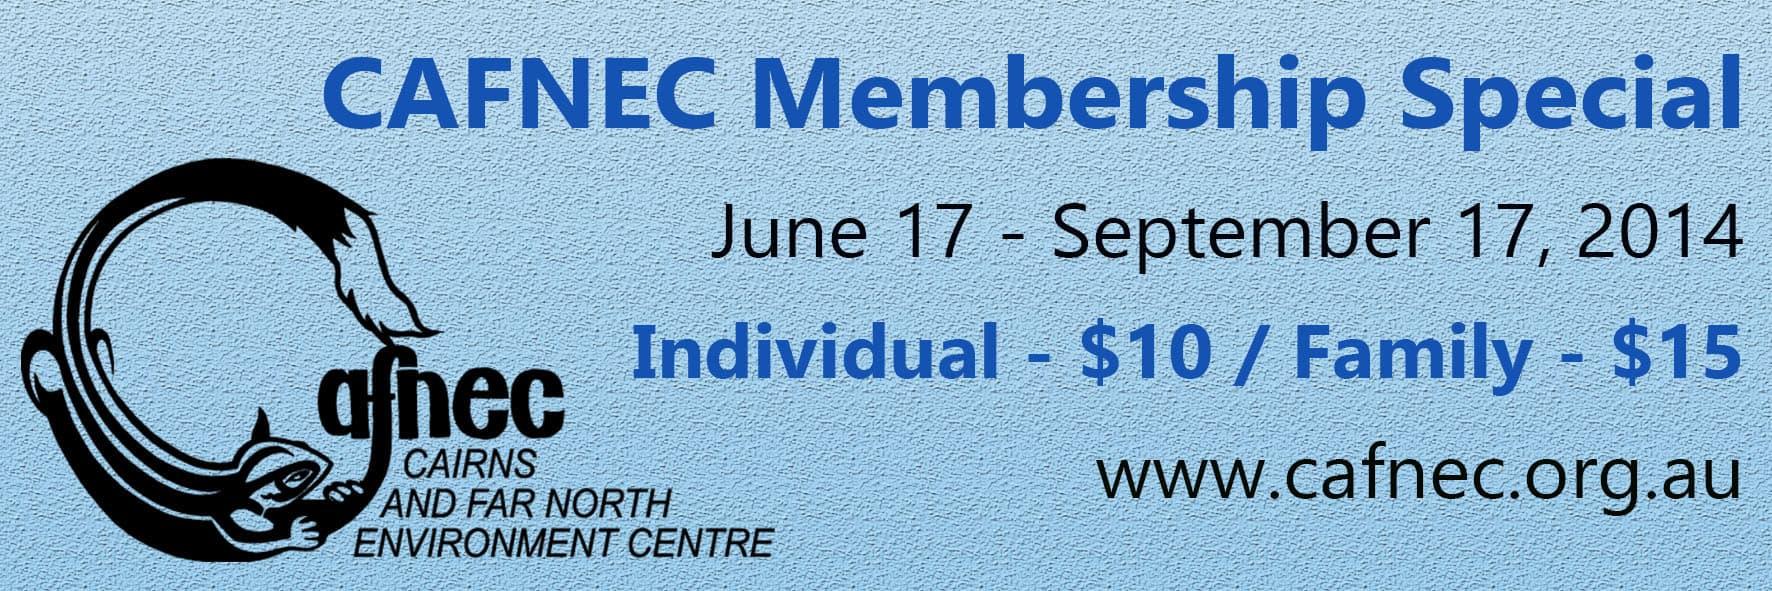 CAFNEC Membership Special